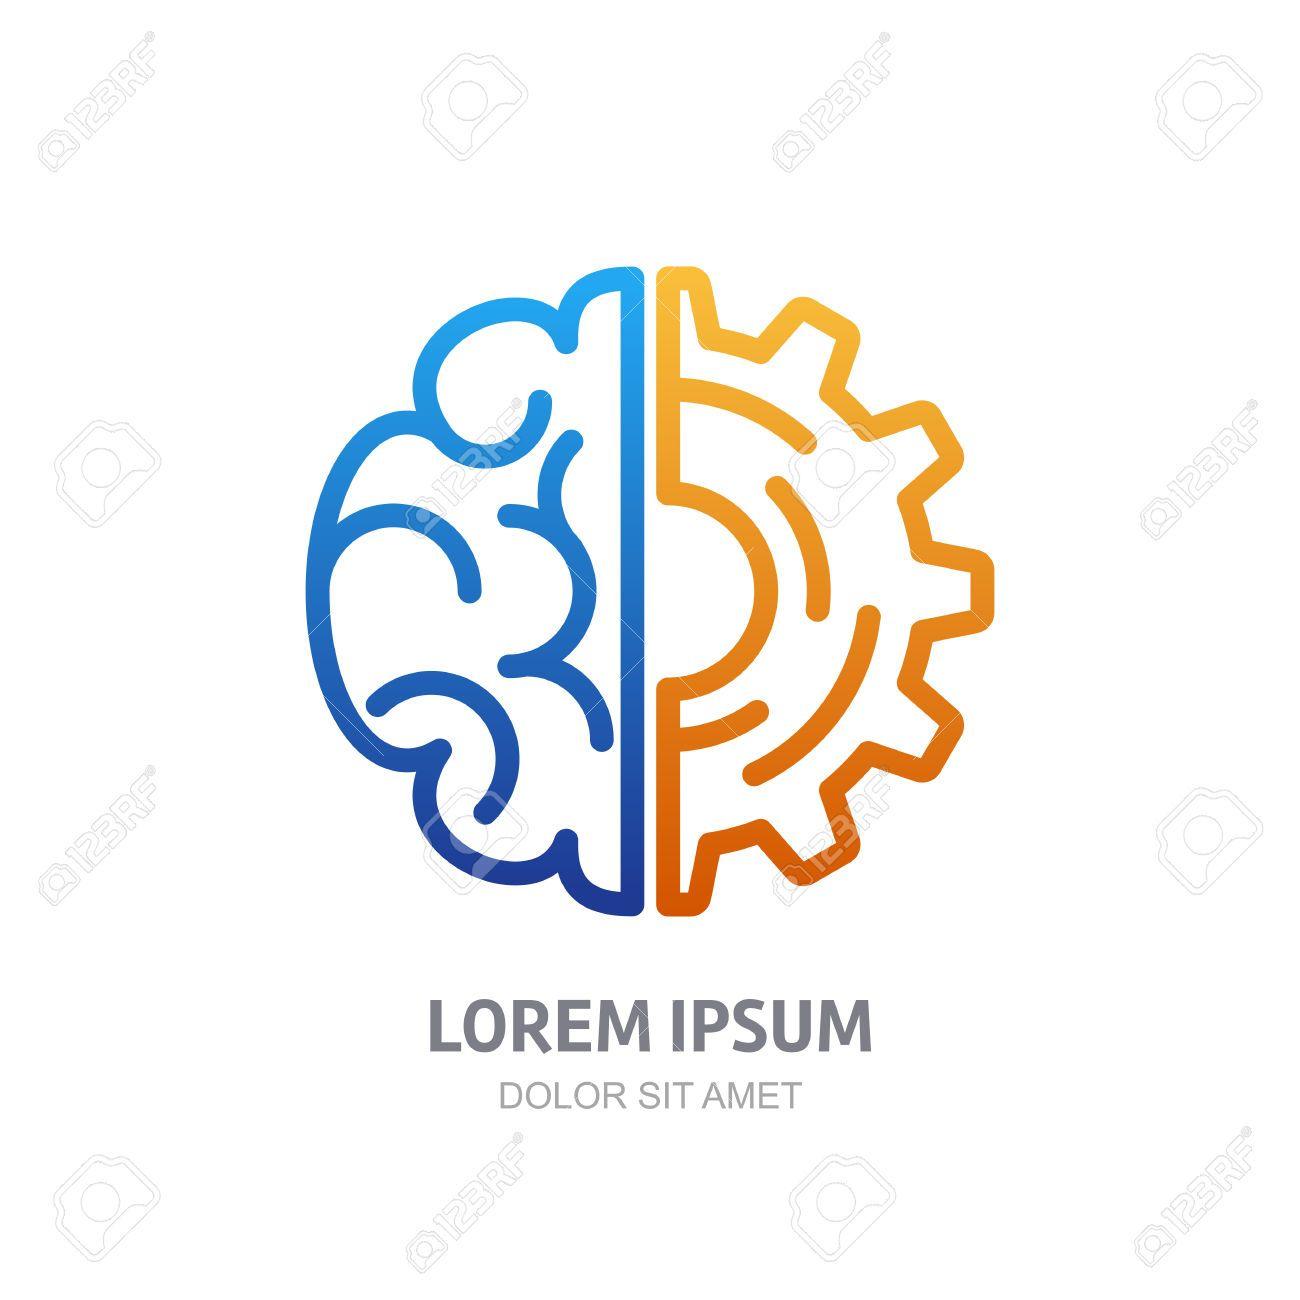 Brain logo cliparts stock vector and royalty free brain logo brain logo cliparts stock vector and royalty free brain logo biocorpaavc Images